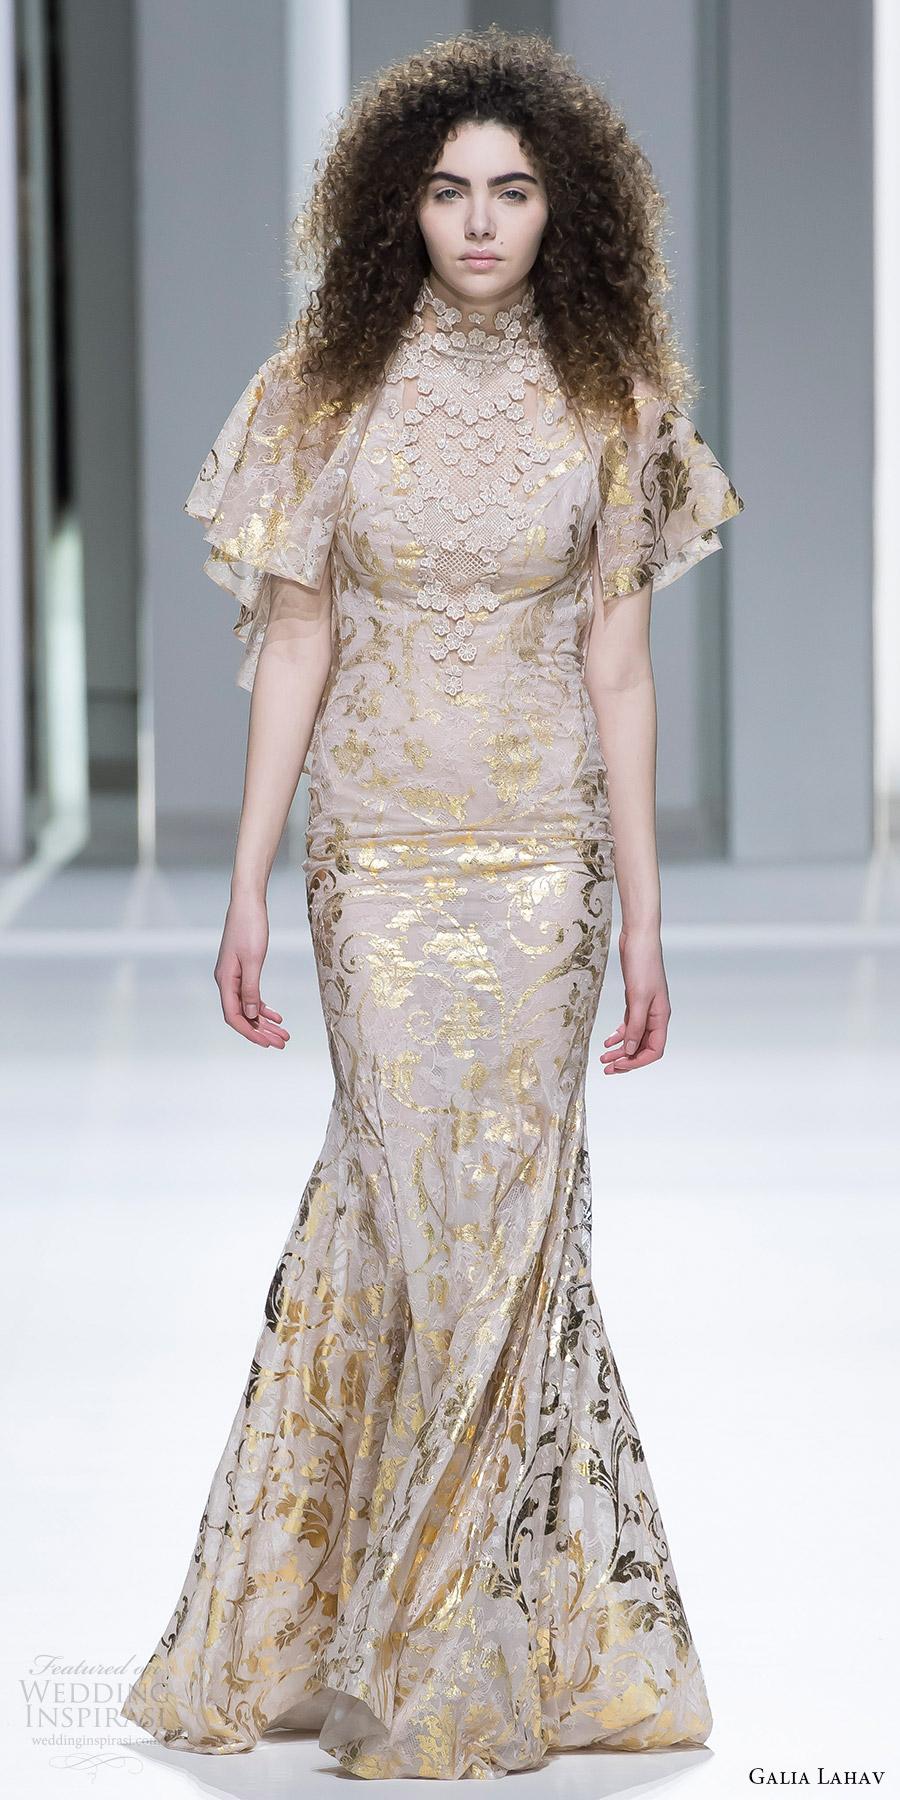 galia lahav haute couture spring 2017 (evie ray) gown